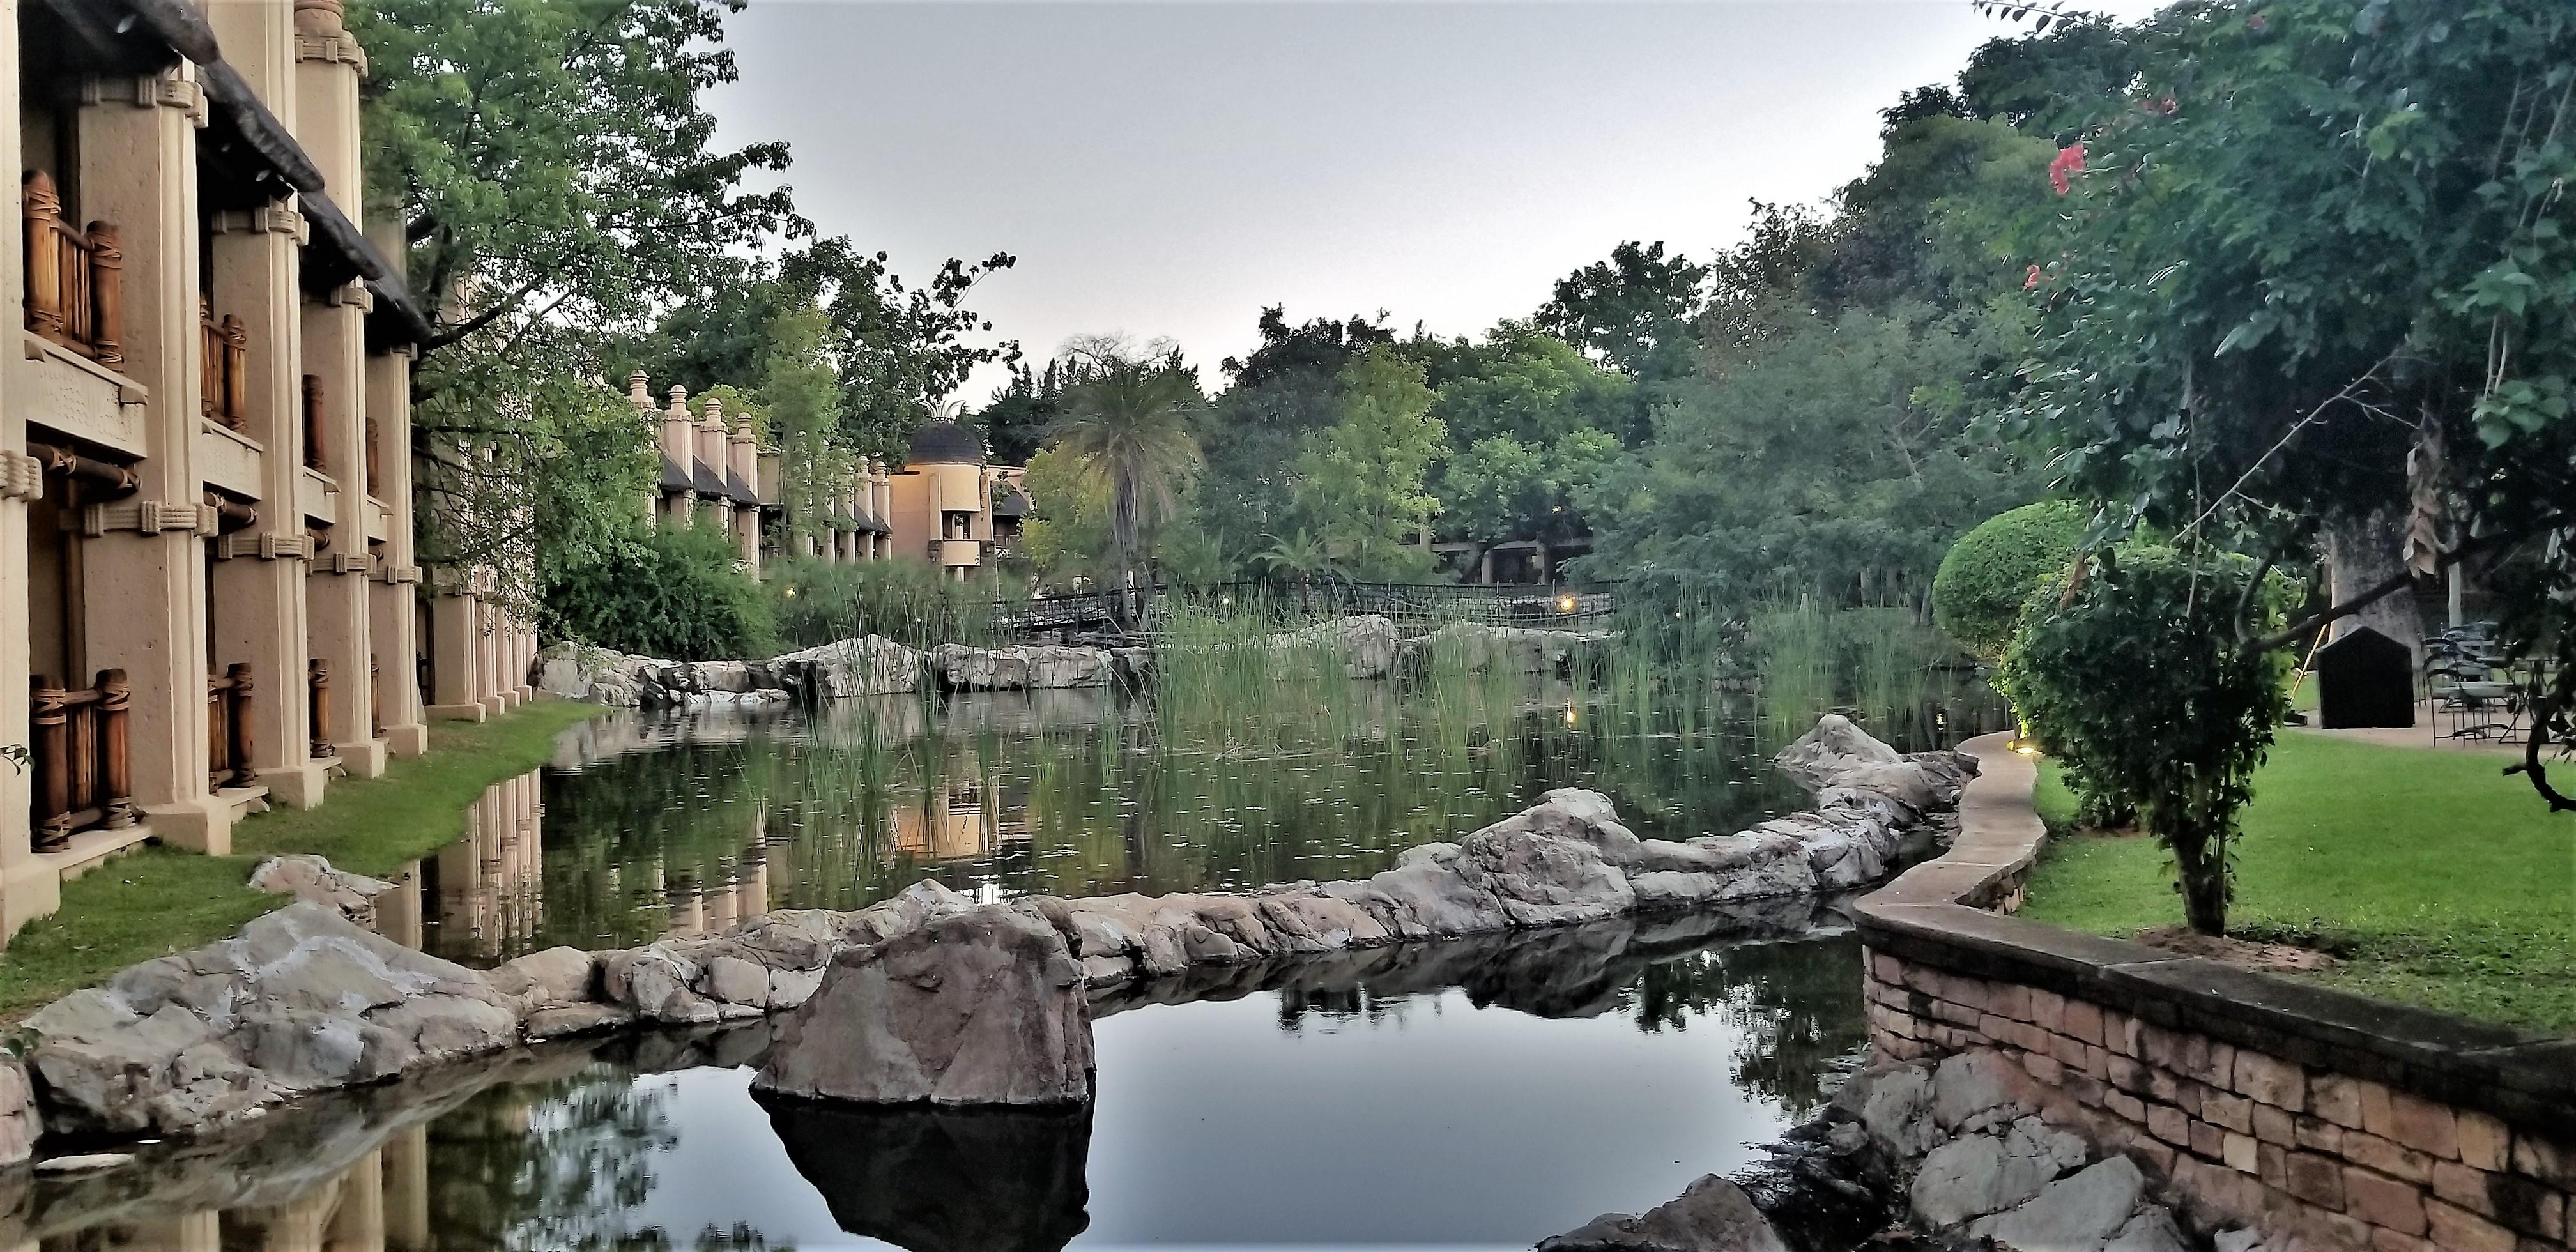 Kingdom pond